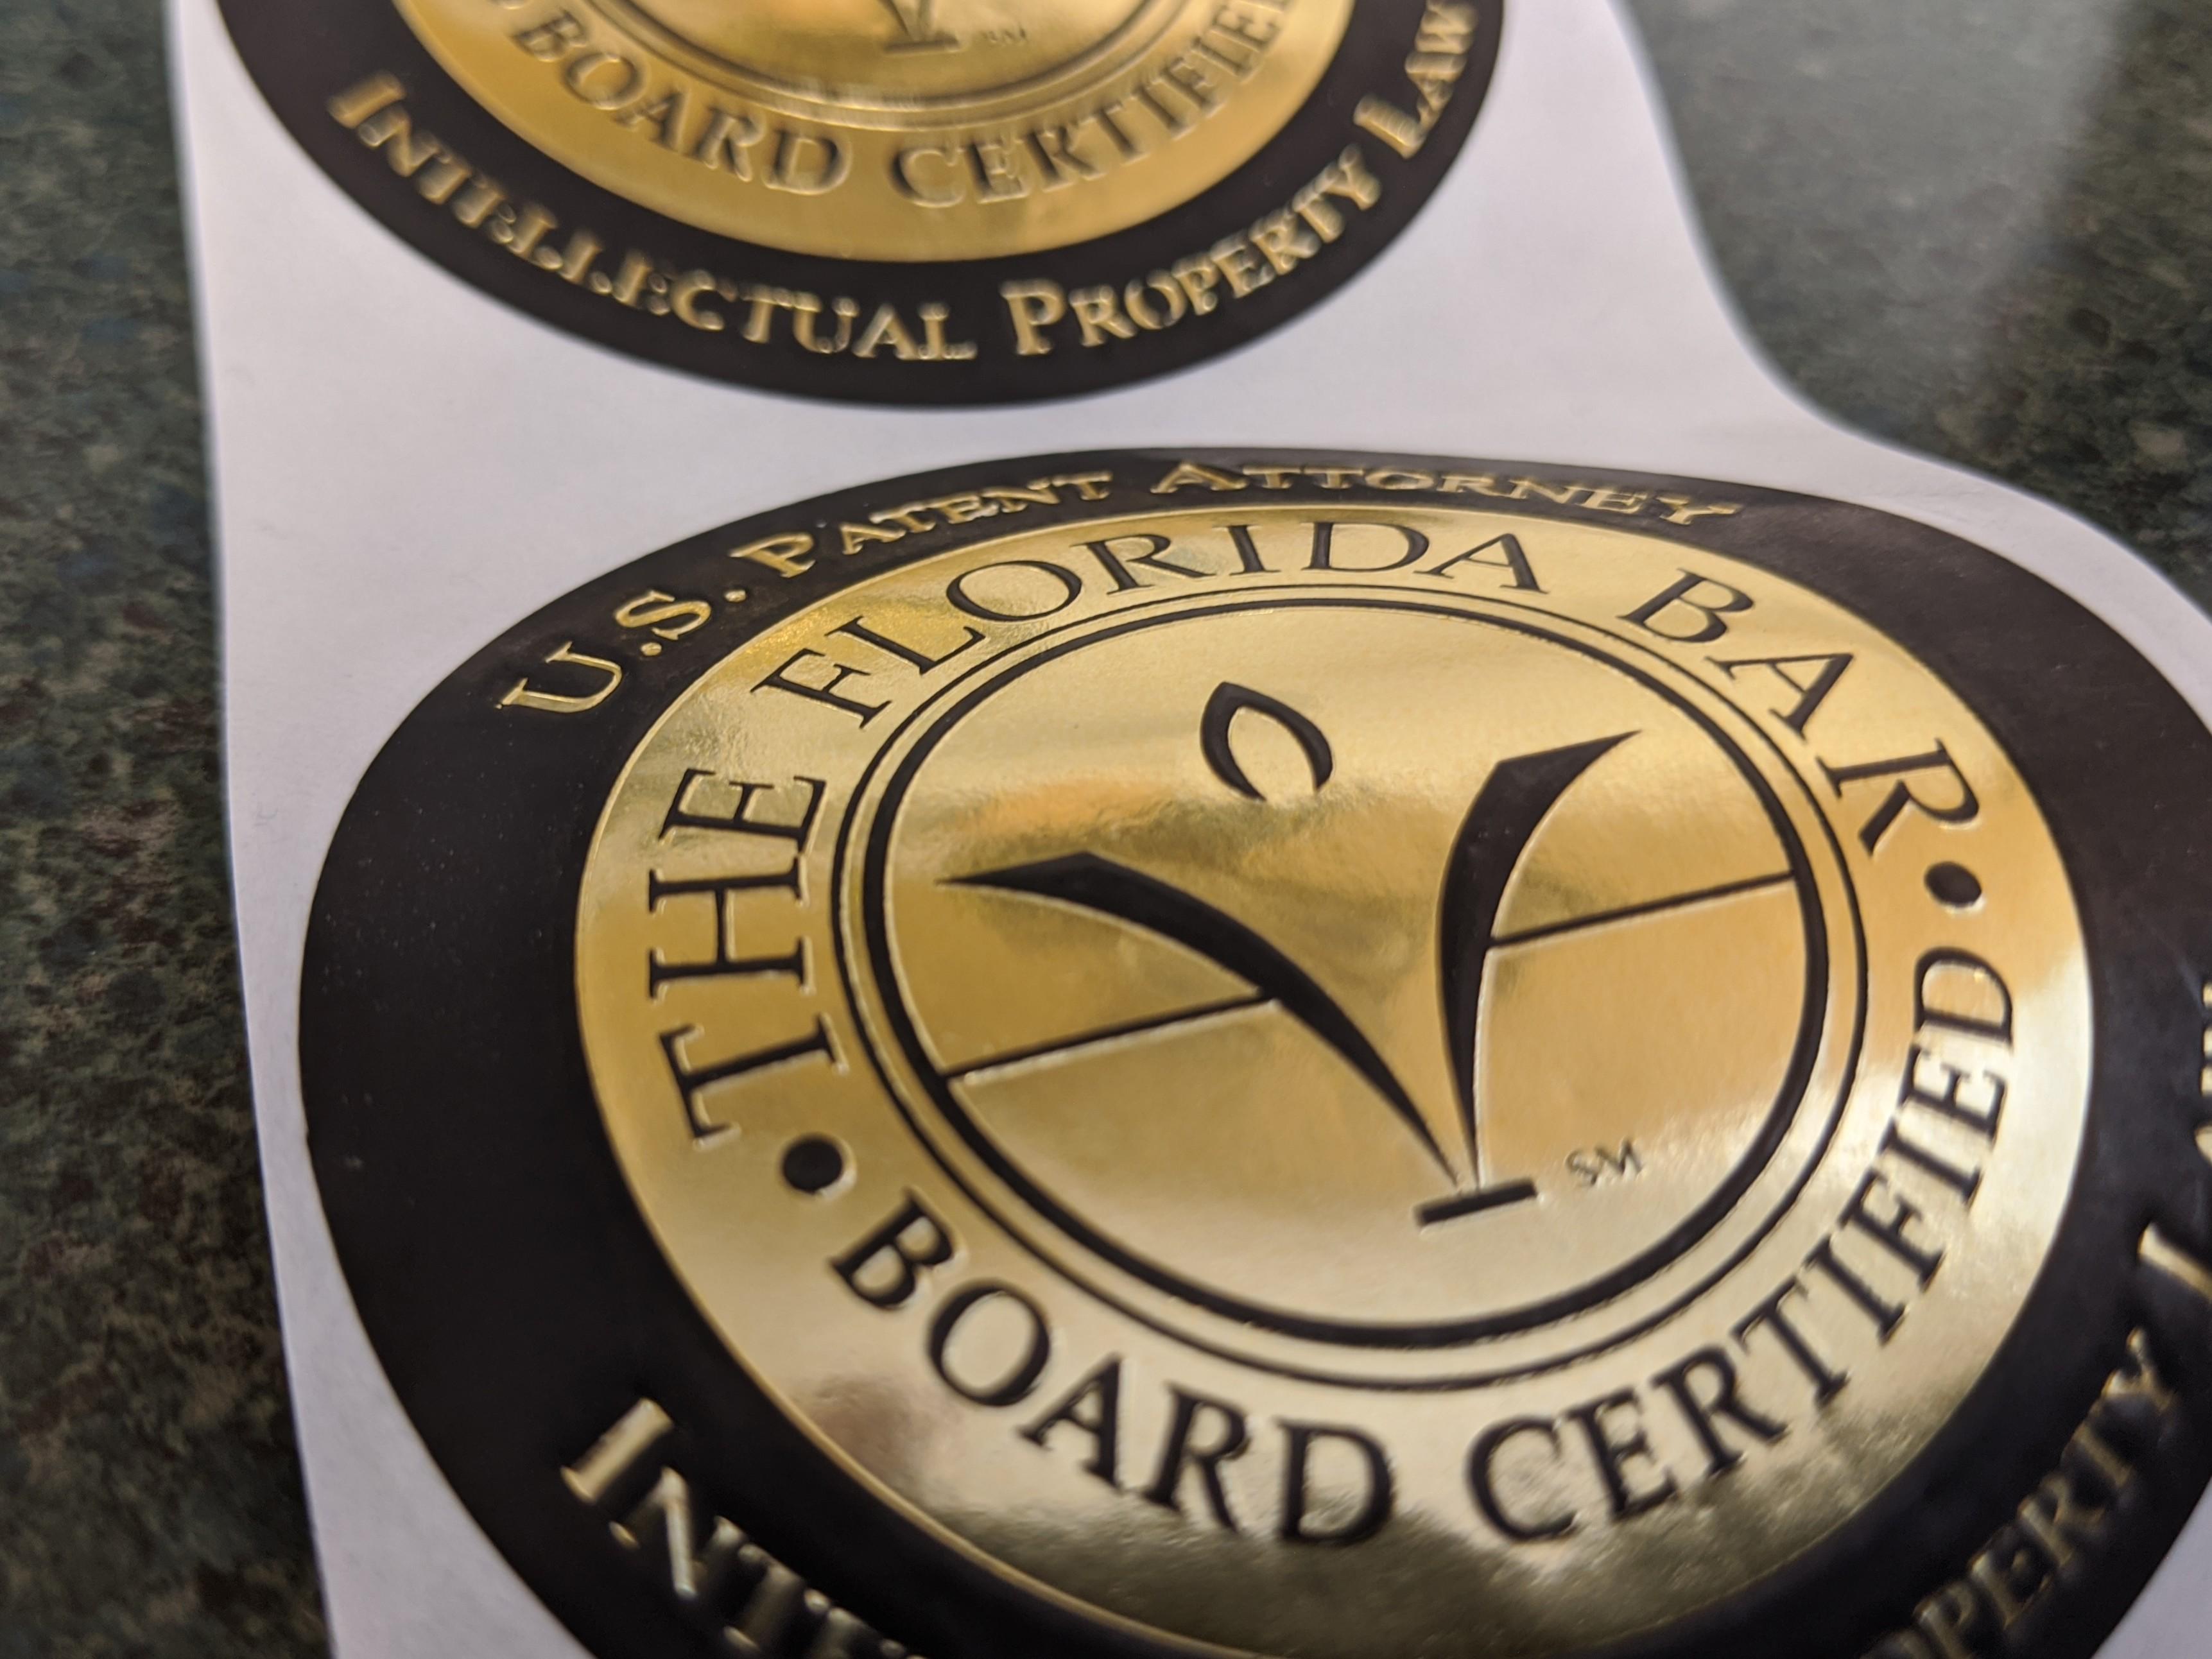 Branding of Florida Bar Board certification designation